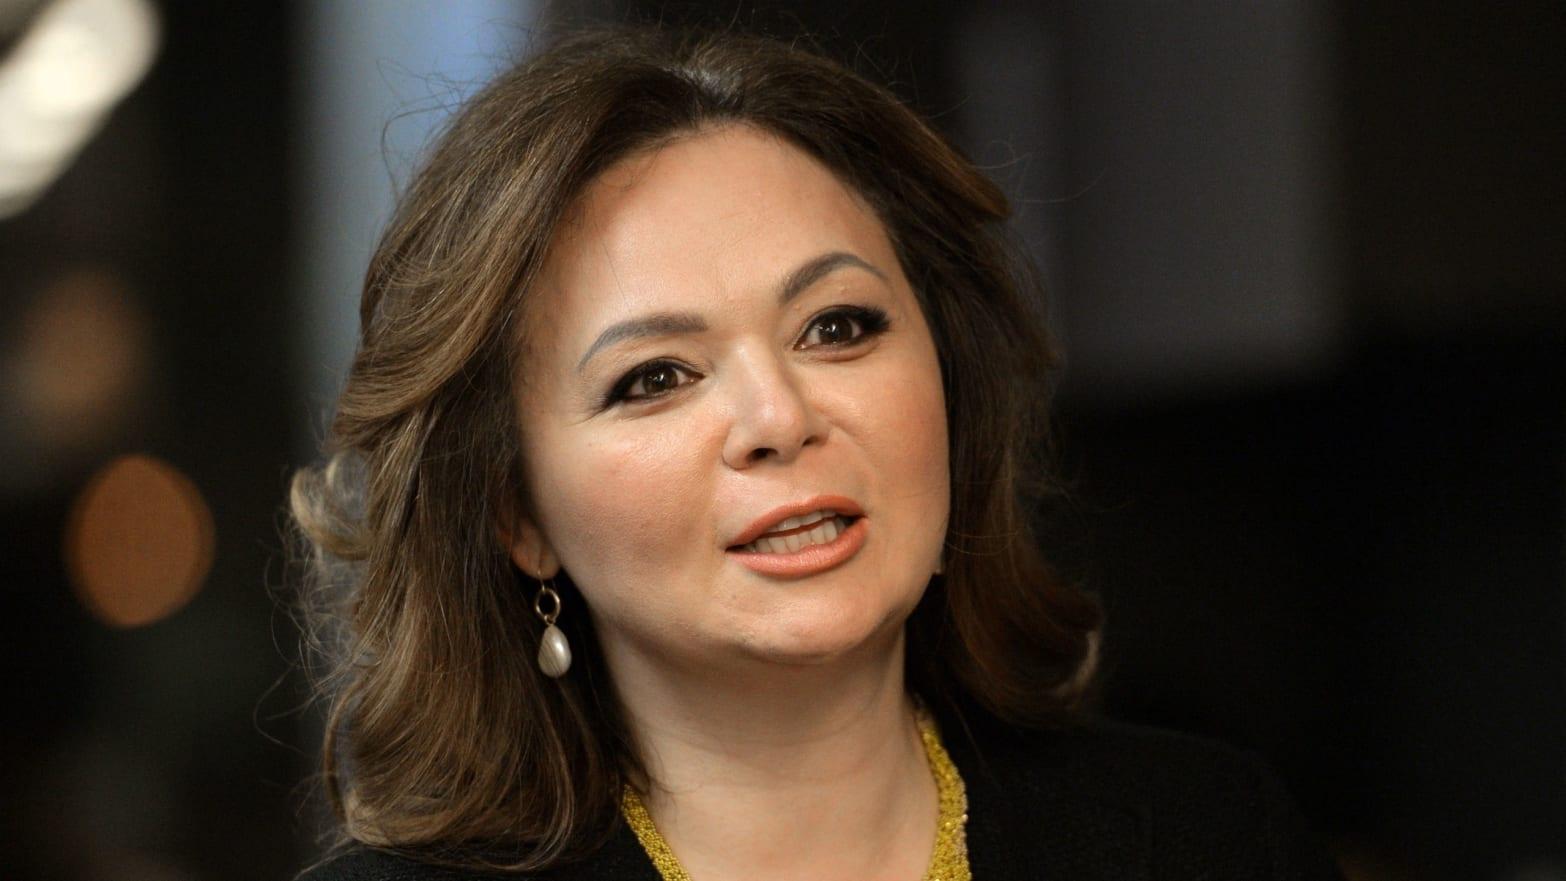 Trump Tower Russian Lawyer, Natalia Veselnitskaya, Exposed in Swiss Corruption Case